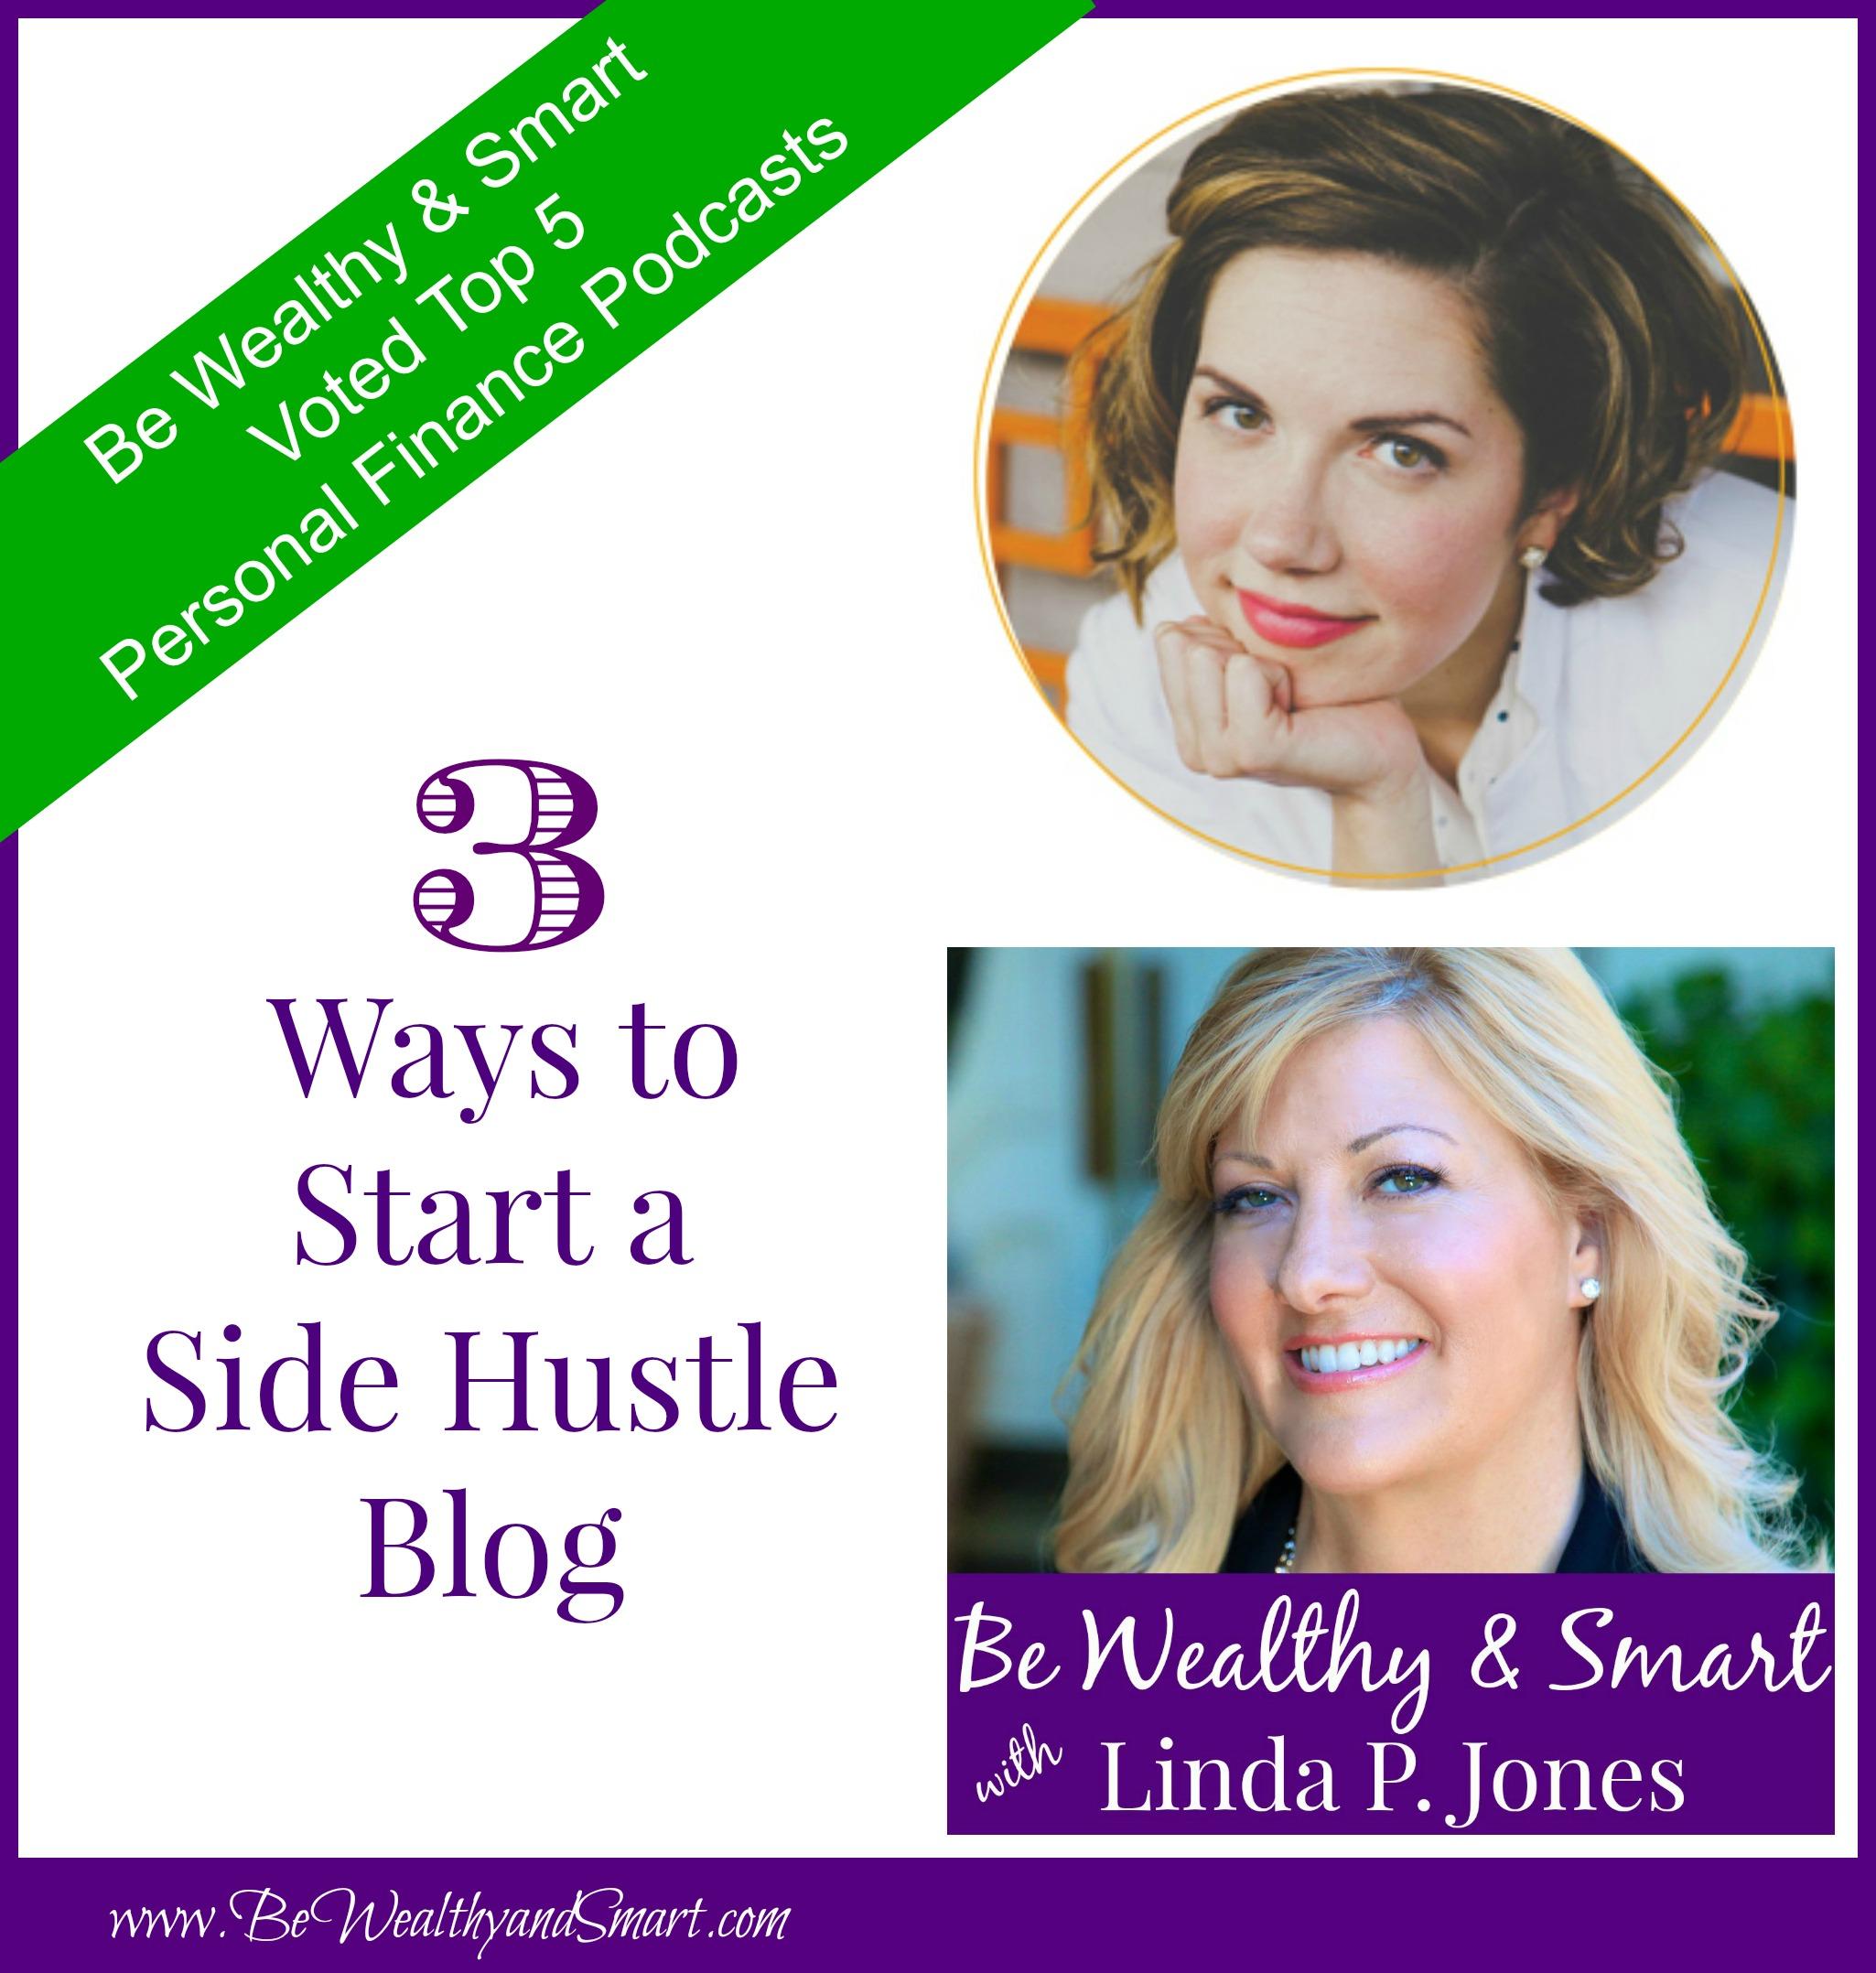 084: 3 Ways to Start a Side Hustle Blog